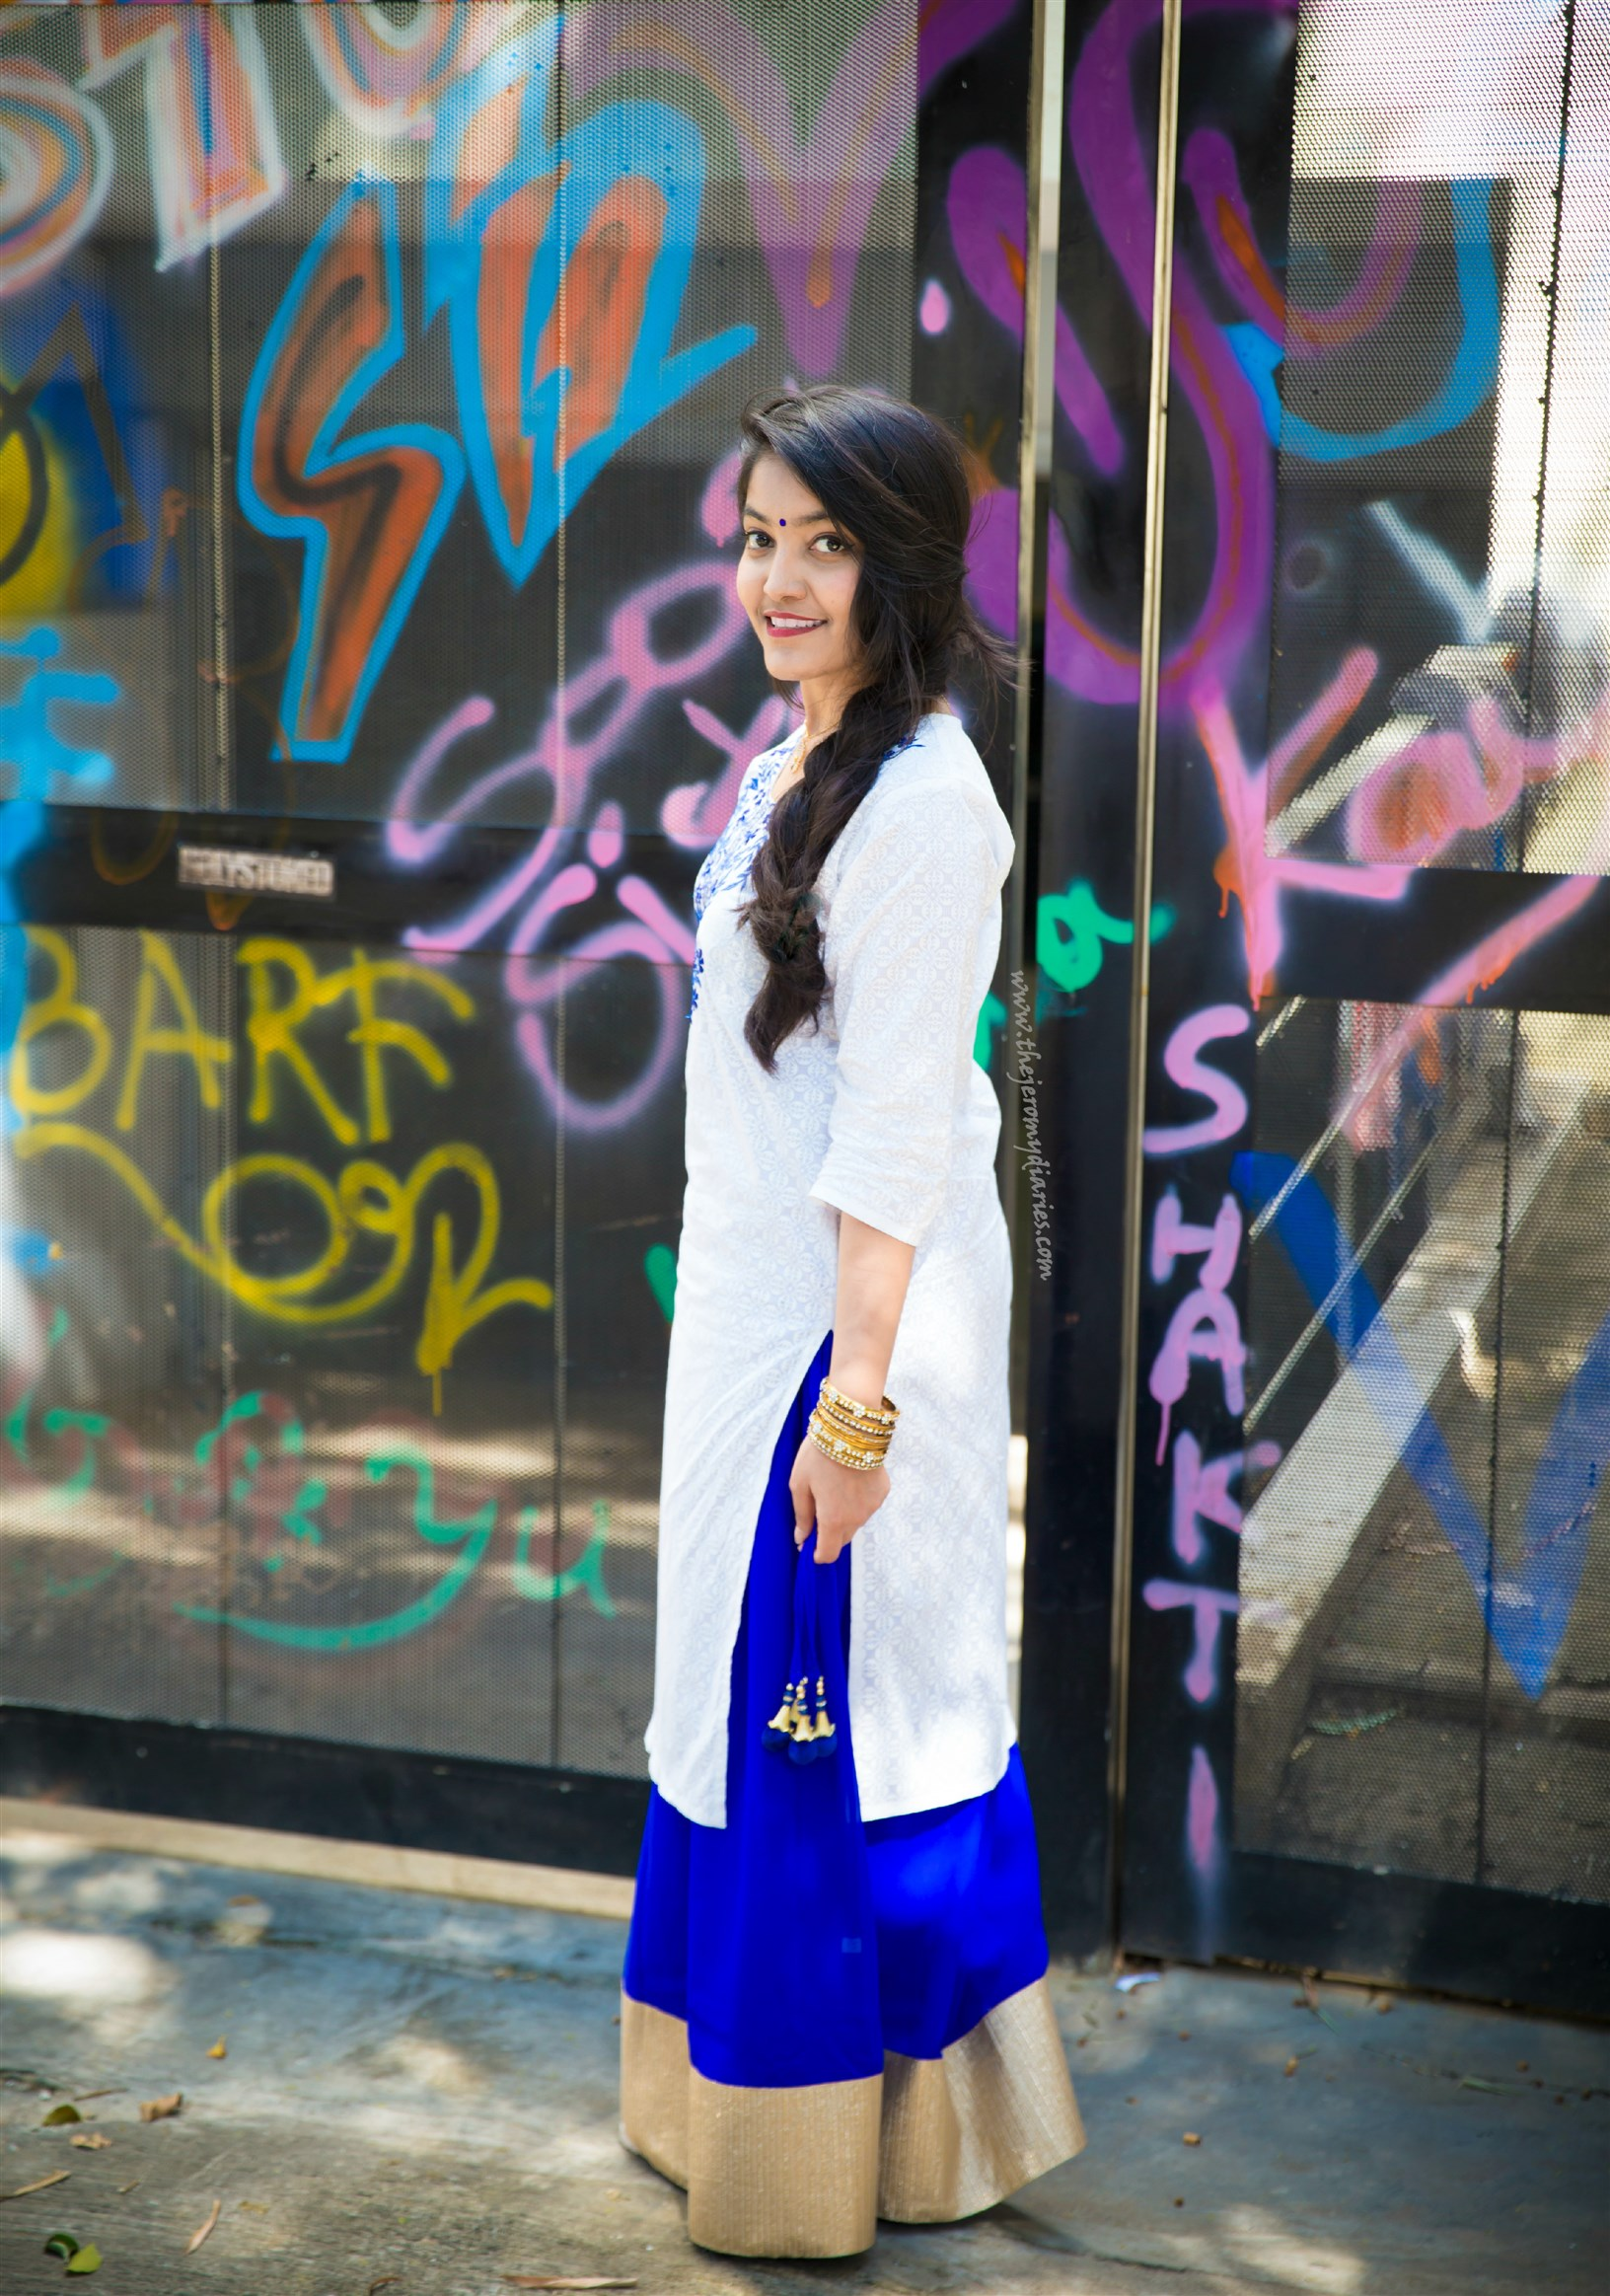 diwali 2015 outfit ideas-001 (1632 x 2327)